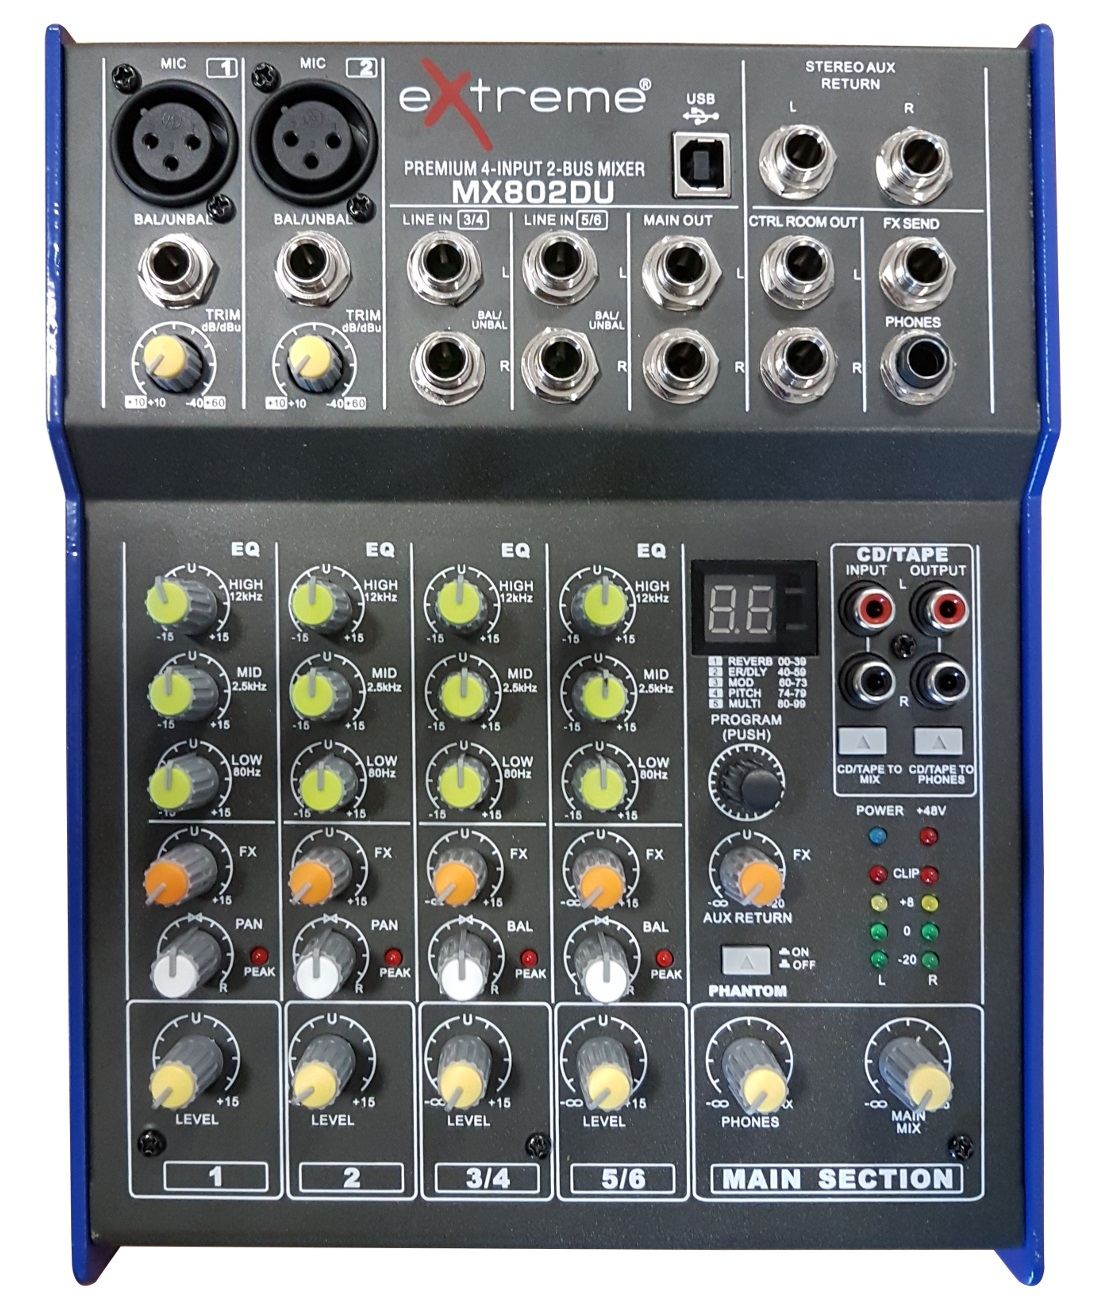 EXTREME MX802DU MIXER 4 CANALI COMPATTO PER LIVE PHANTOM POWER +48V + EFFETTI DSP + USB 0